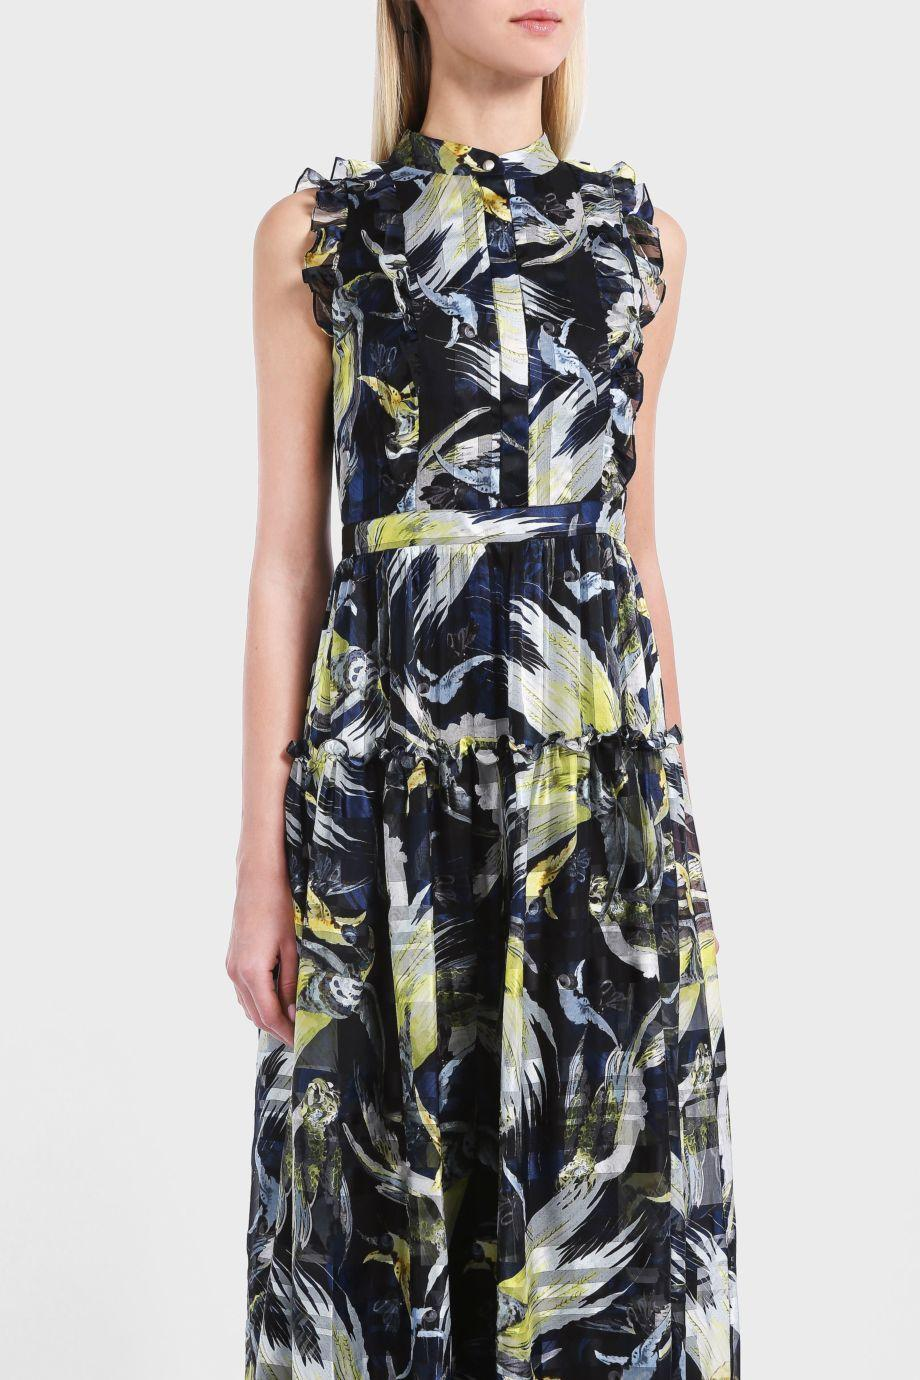 ERDEM Ava Printed Silk-Chiffon Gown, Multicoloured